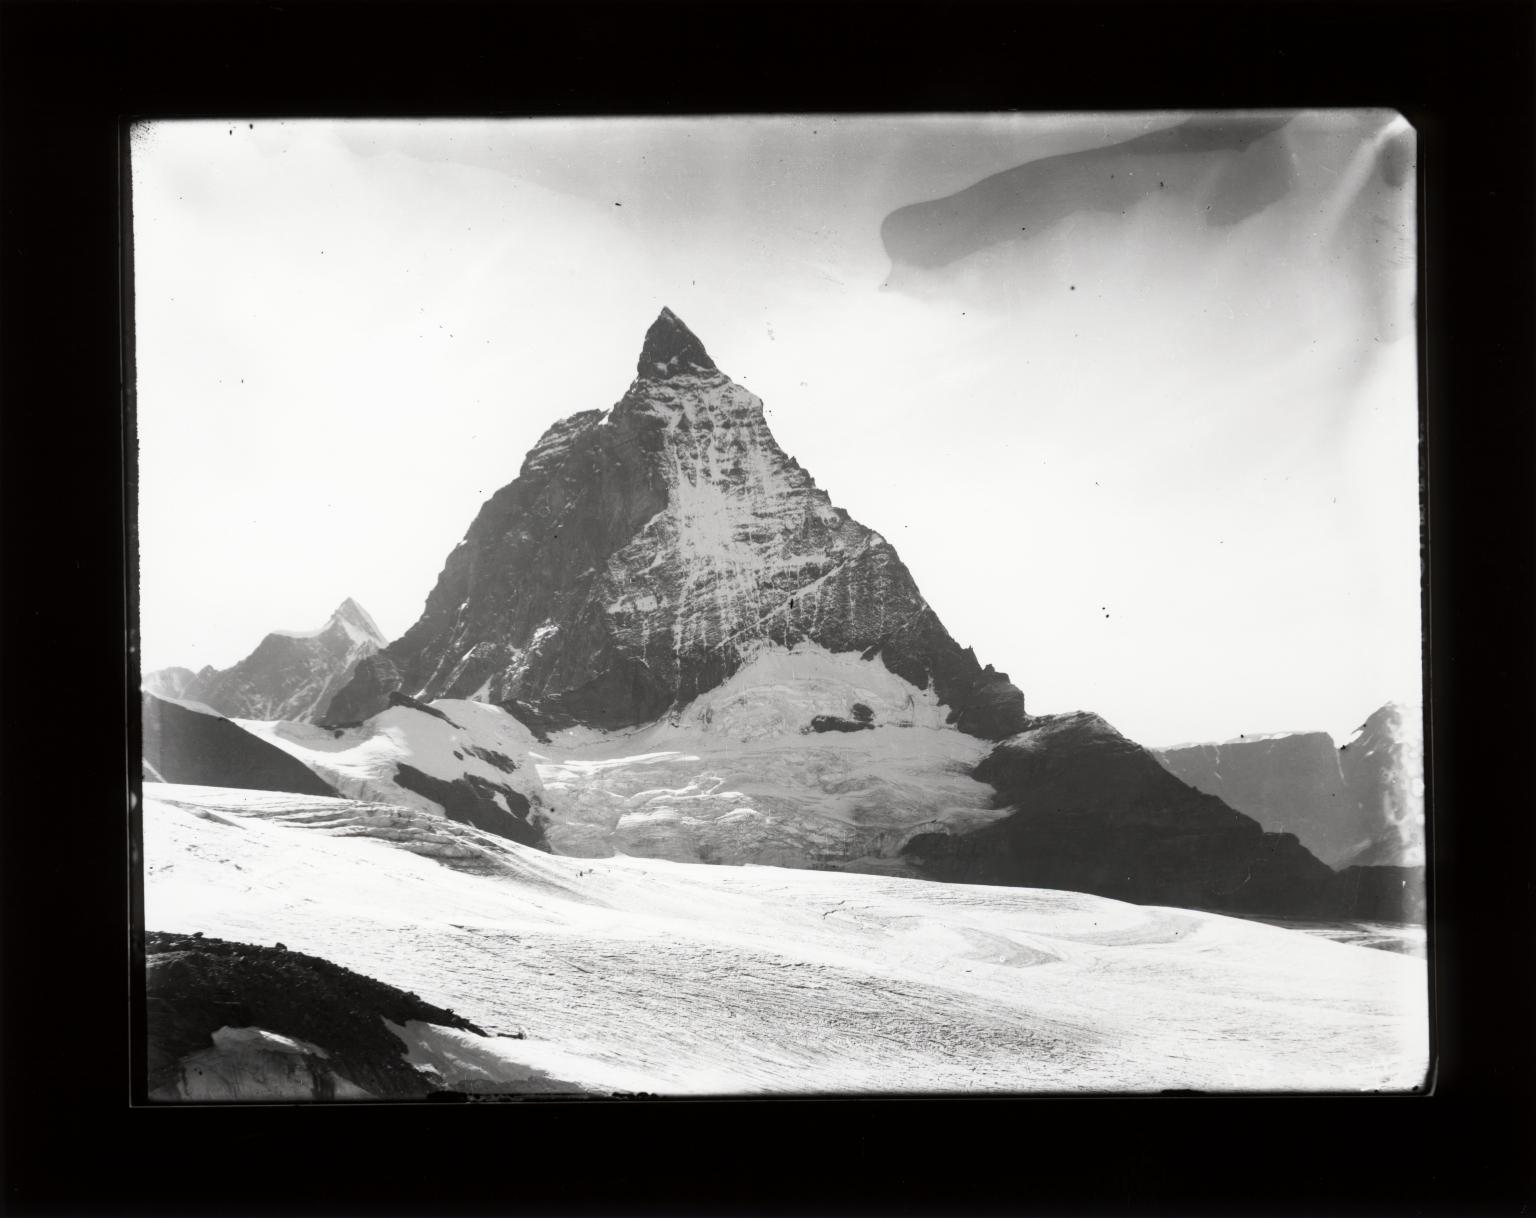 Matterhorn from Theodul Pass, Italy and Switzerland